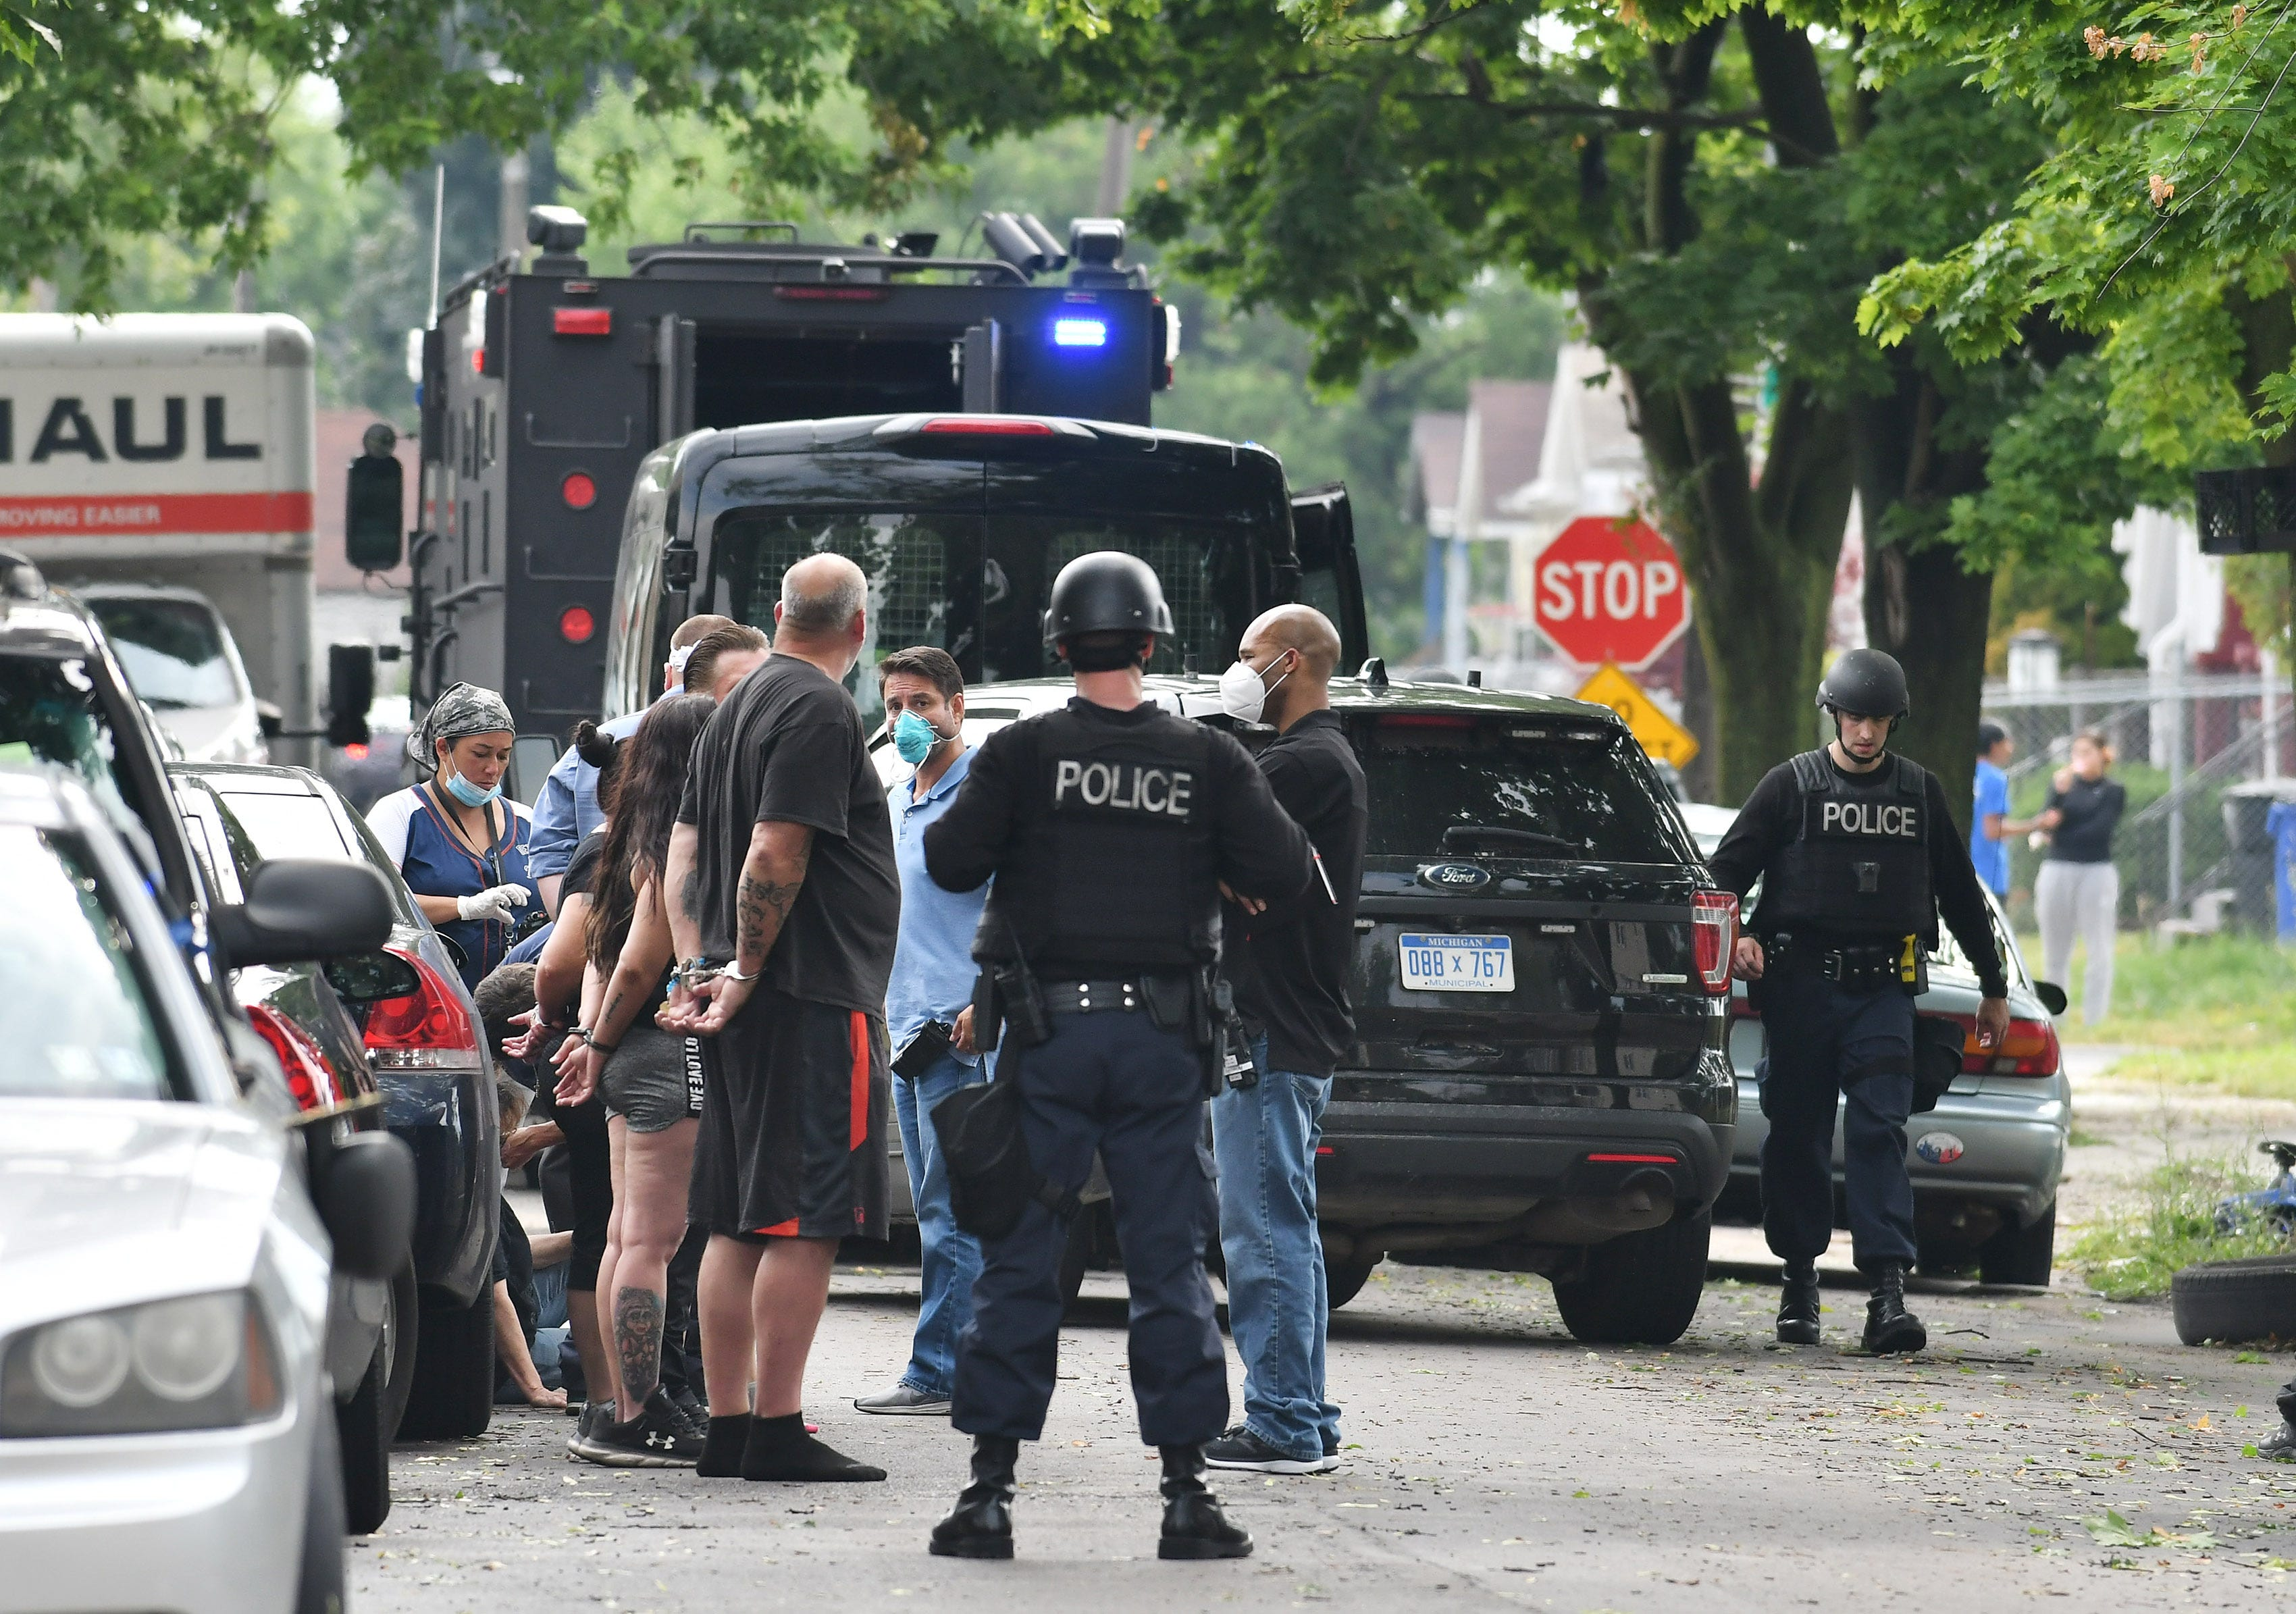 Detroit remains among nation's most violent big cities, FBI statistics show